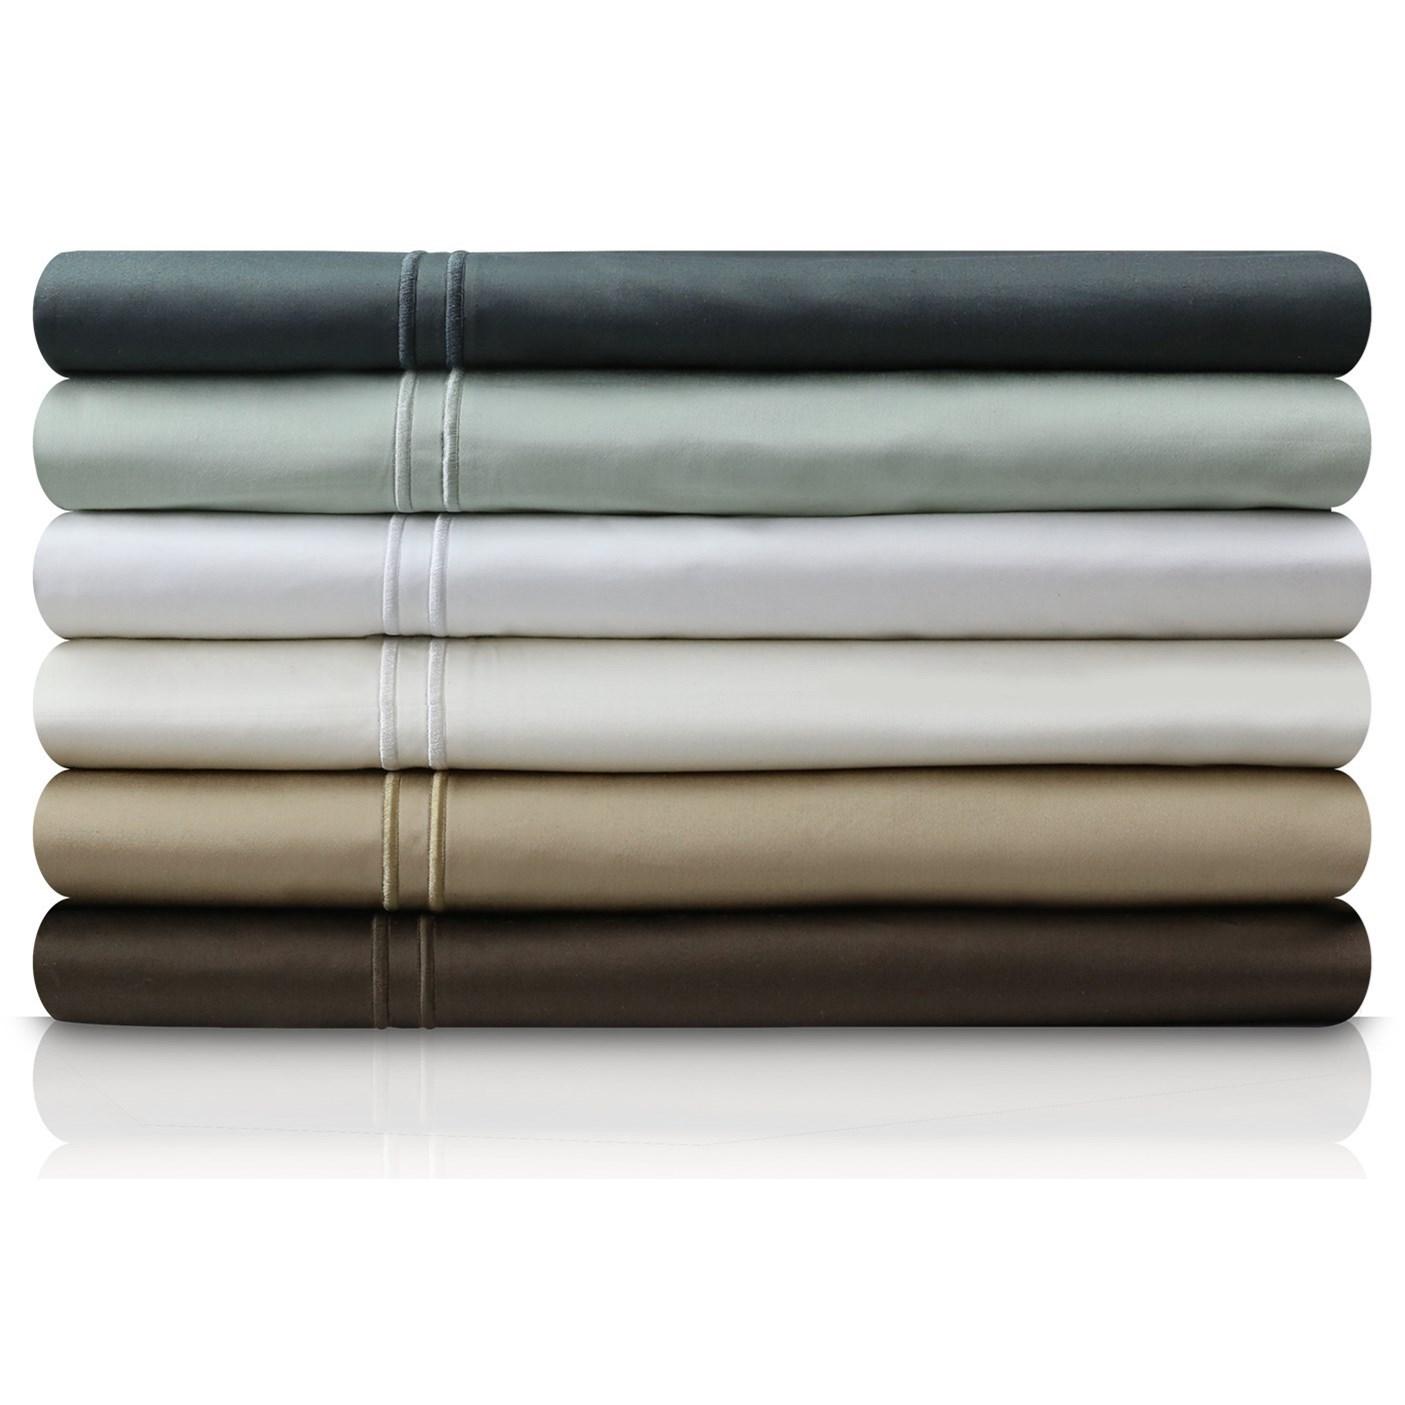 Malouf Egyptian Cotton King 600 TC Egyptian Cotton Pillowcases  - Item Number: MA06KKIVPC